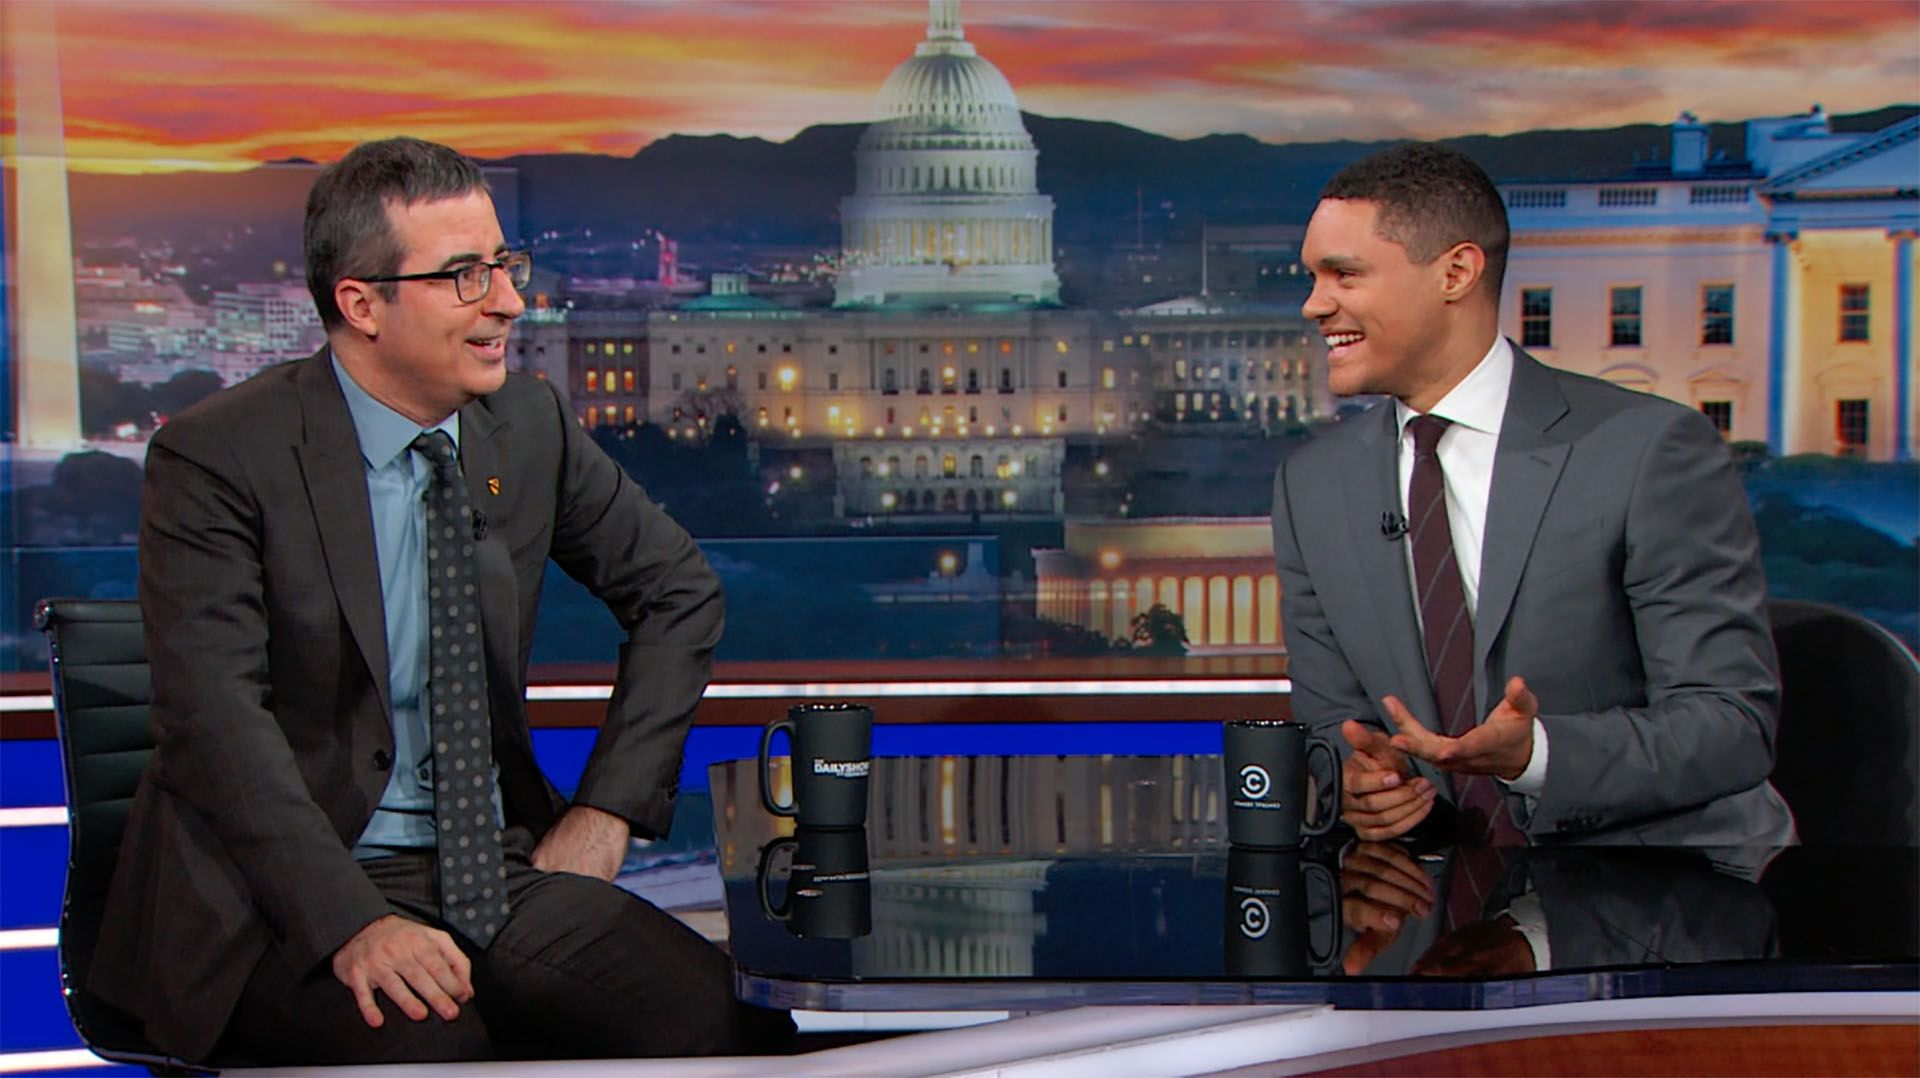 comedic television news shows, john oliver